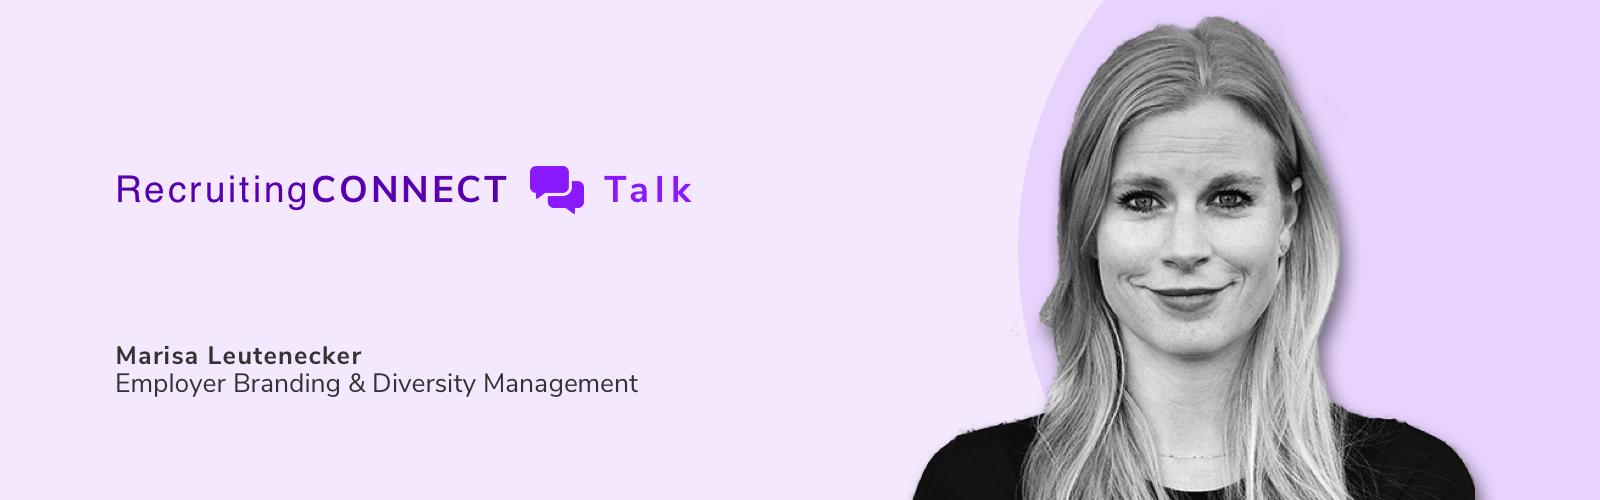 Talentry Webinar RecruitingCONNECT Talk Marisa Leutenecker